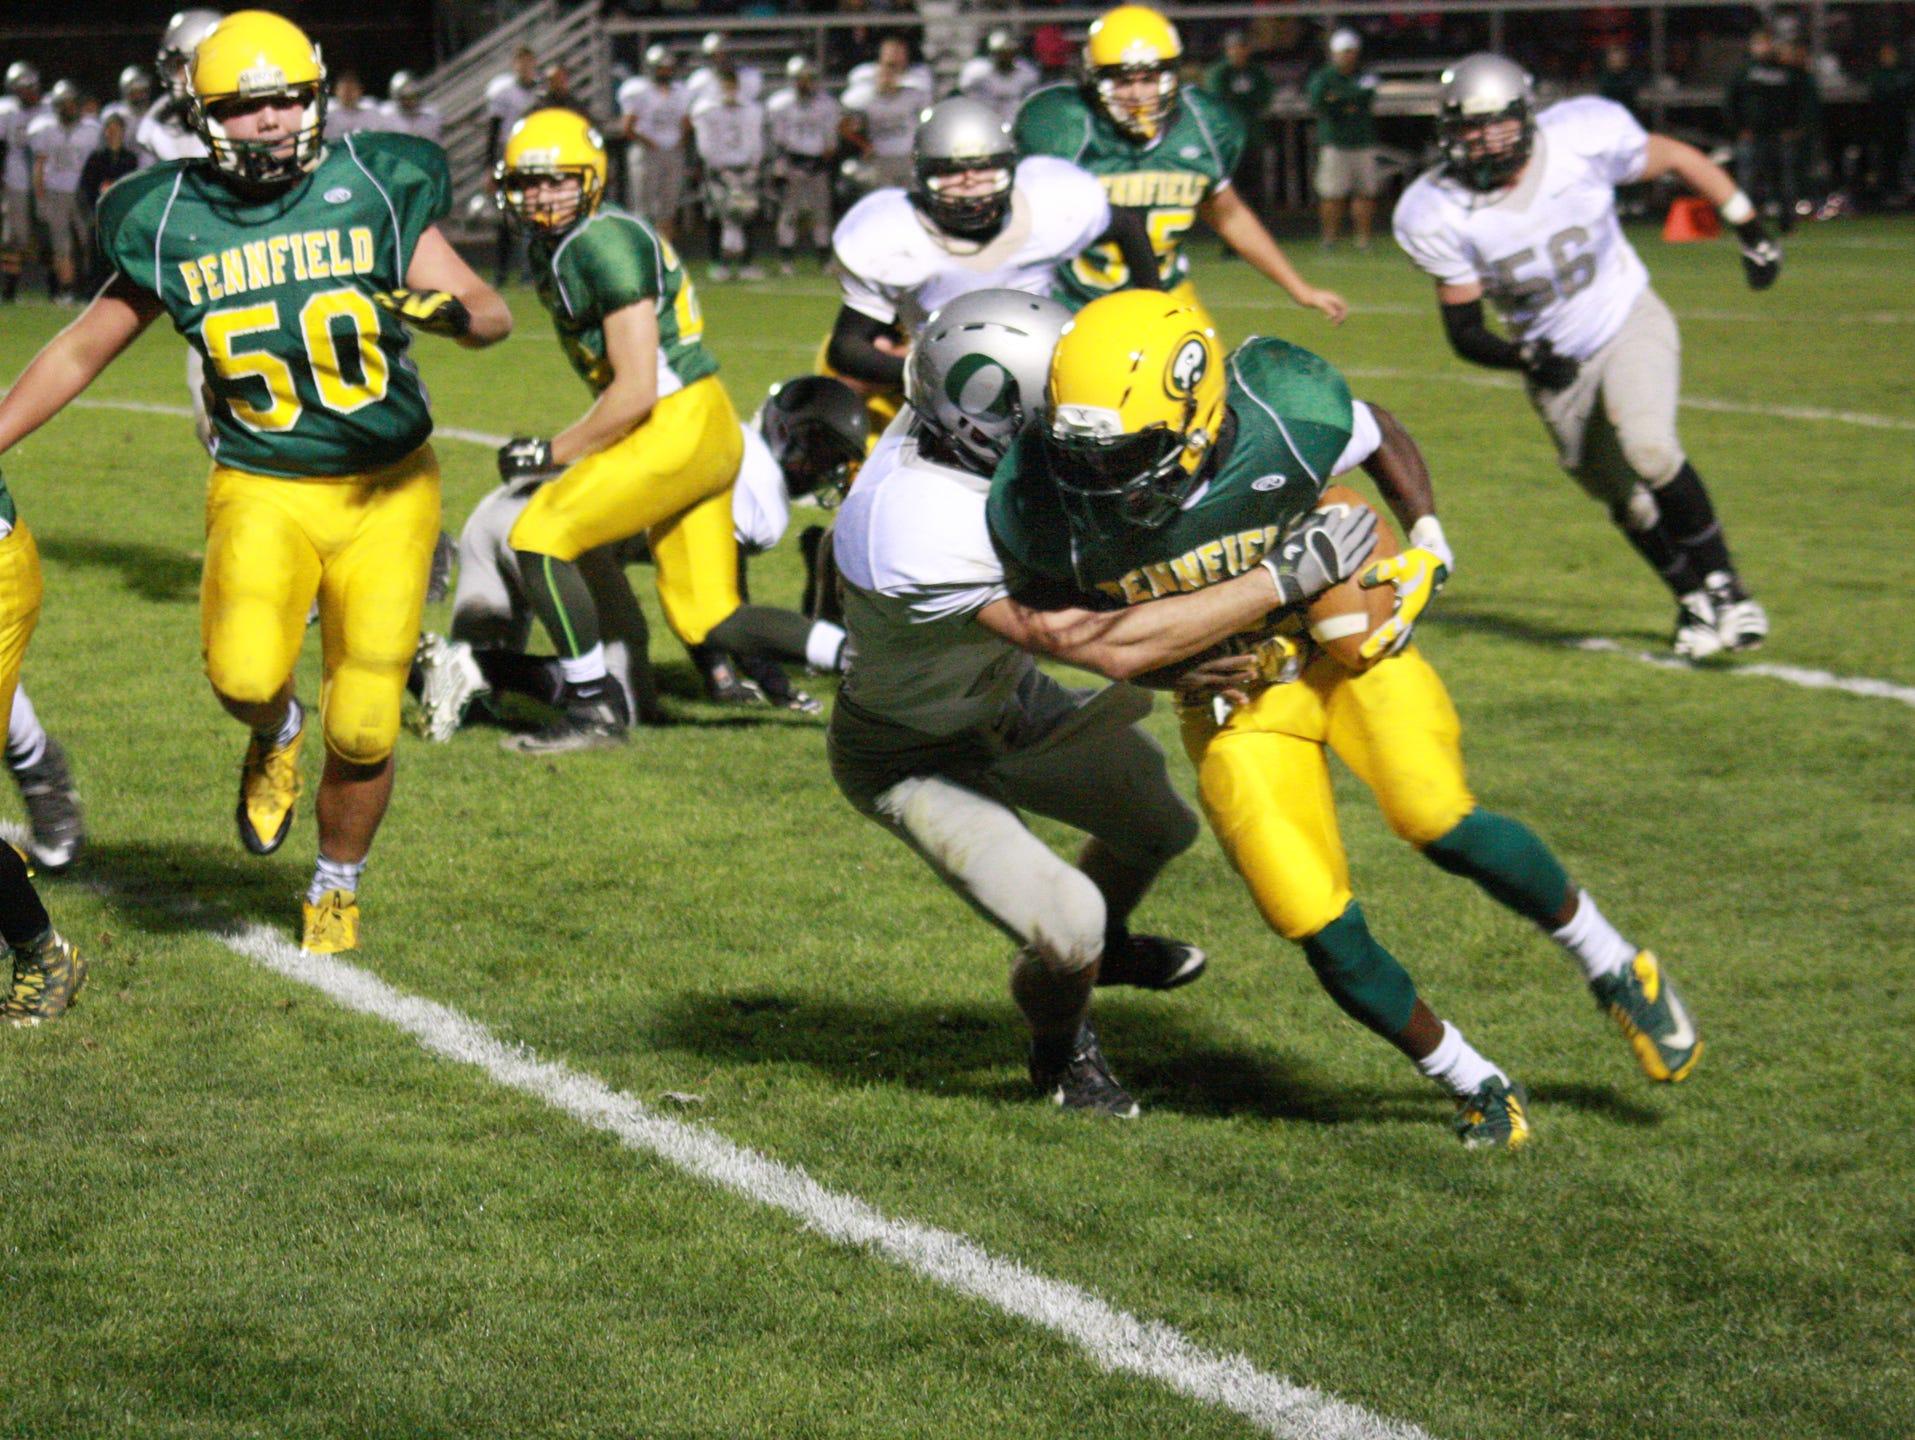 Pennfield High School Quarterback, Parris Bolden gets tackled during Friday night's game against Olivet